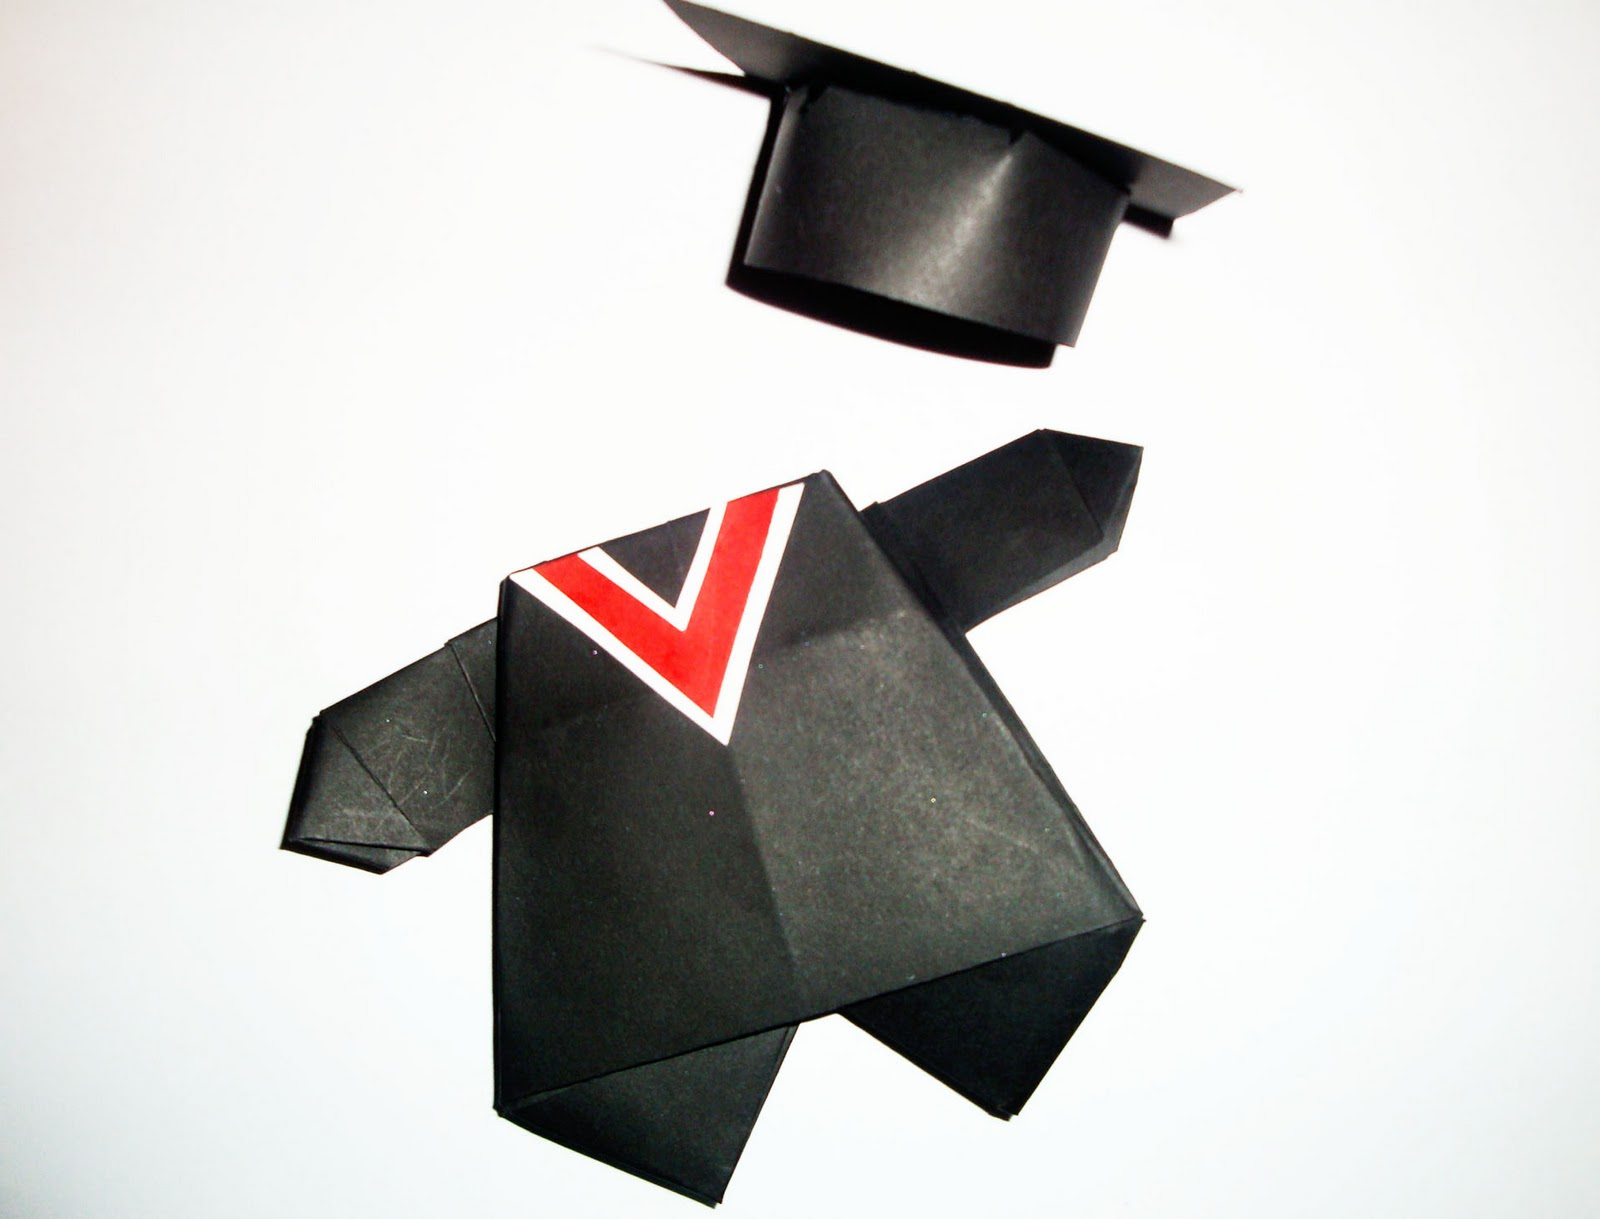 University of Chester Origami Graduate